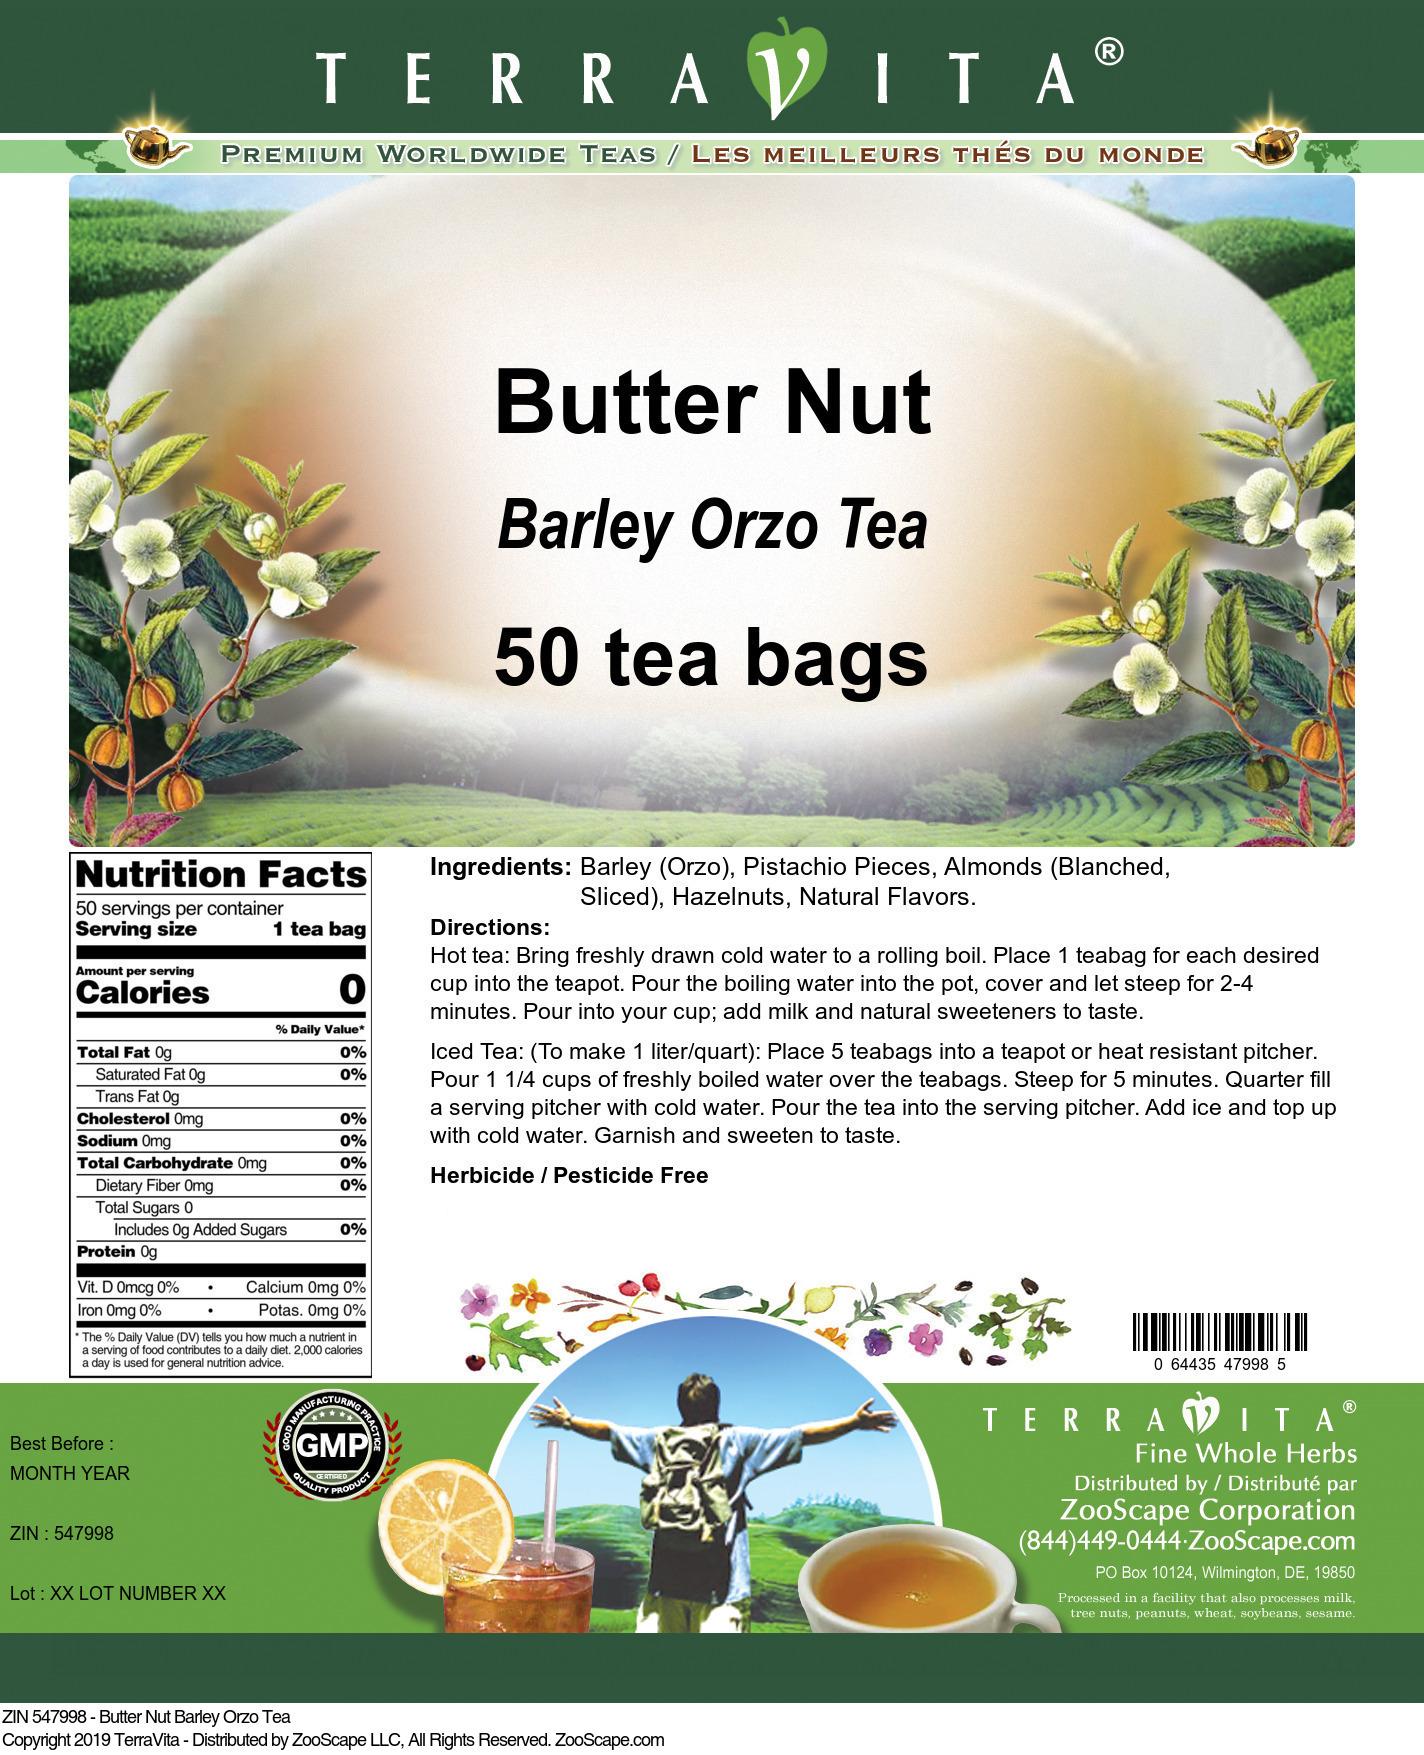 Butter Nut Barley Orzo Tea